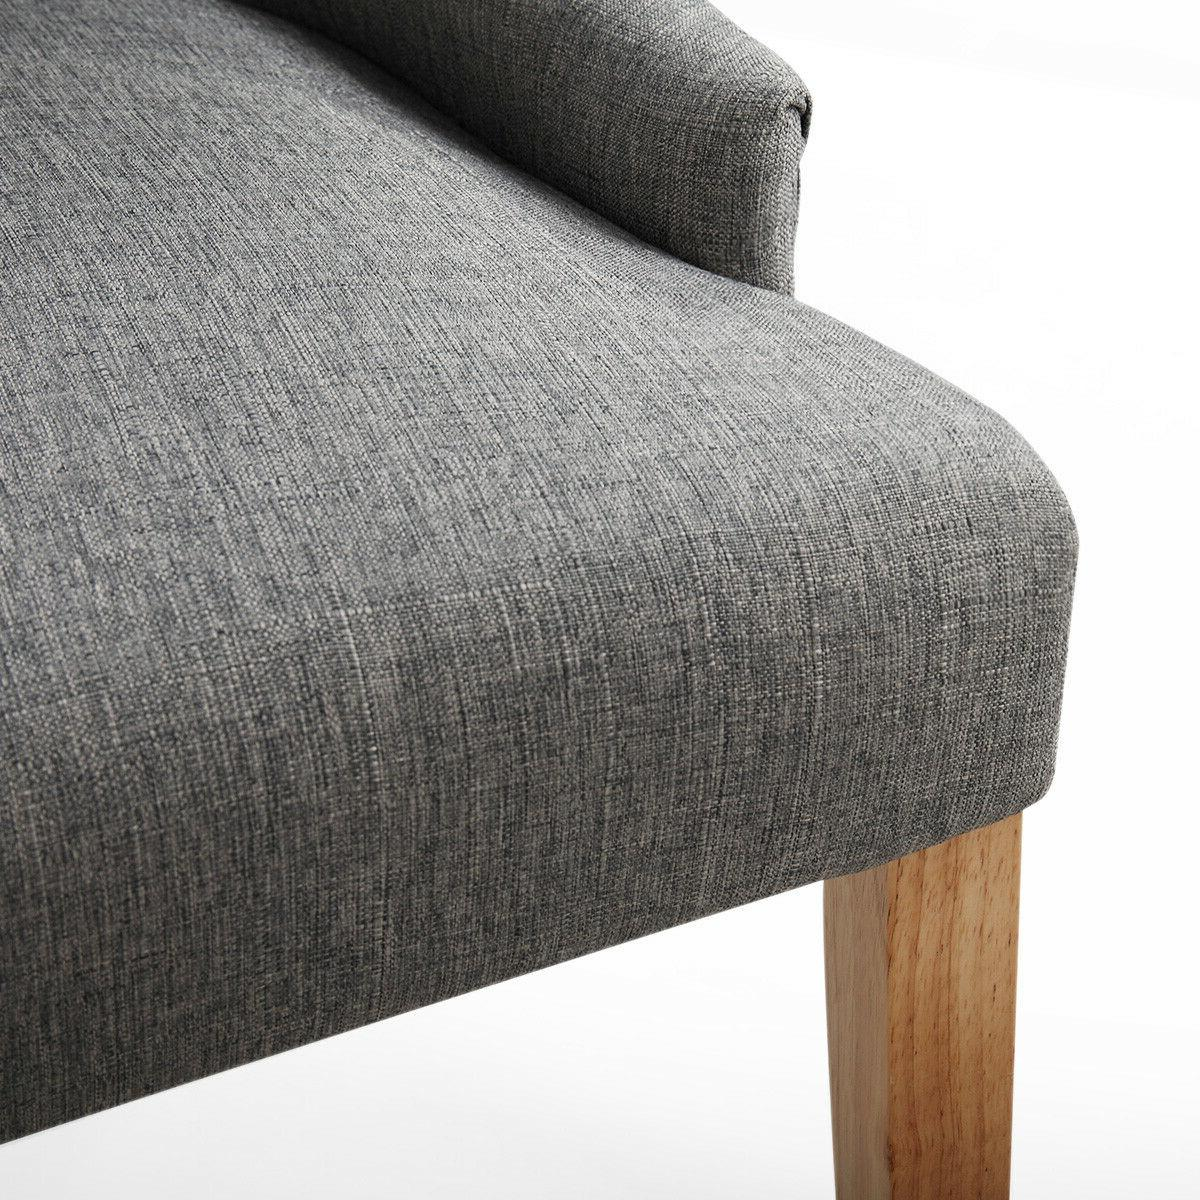 Gray Tufted Modern Side 2 Legs Furniture